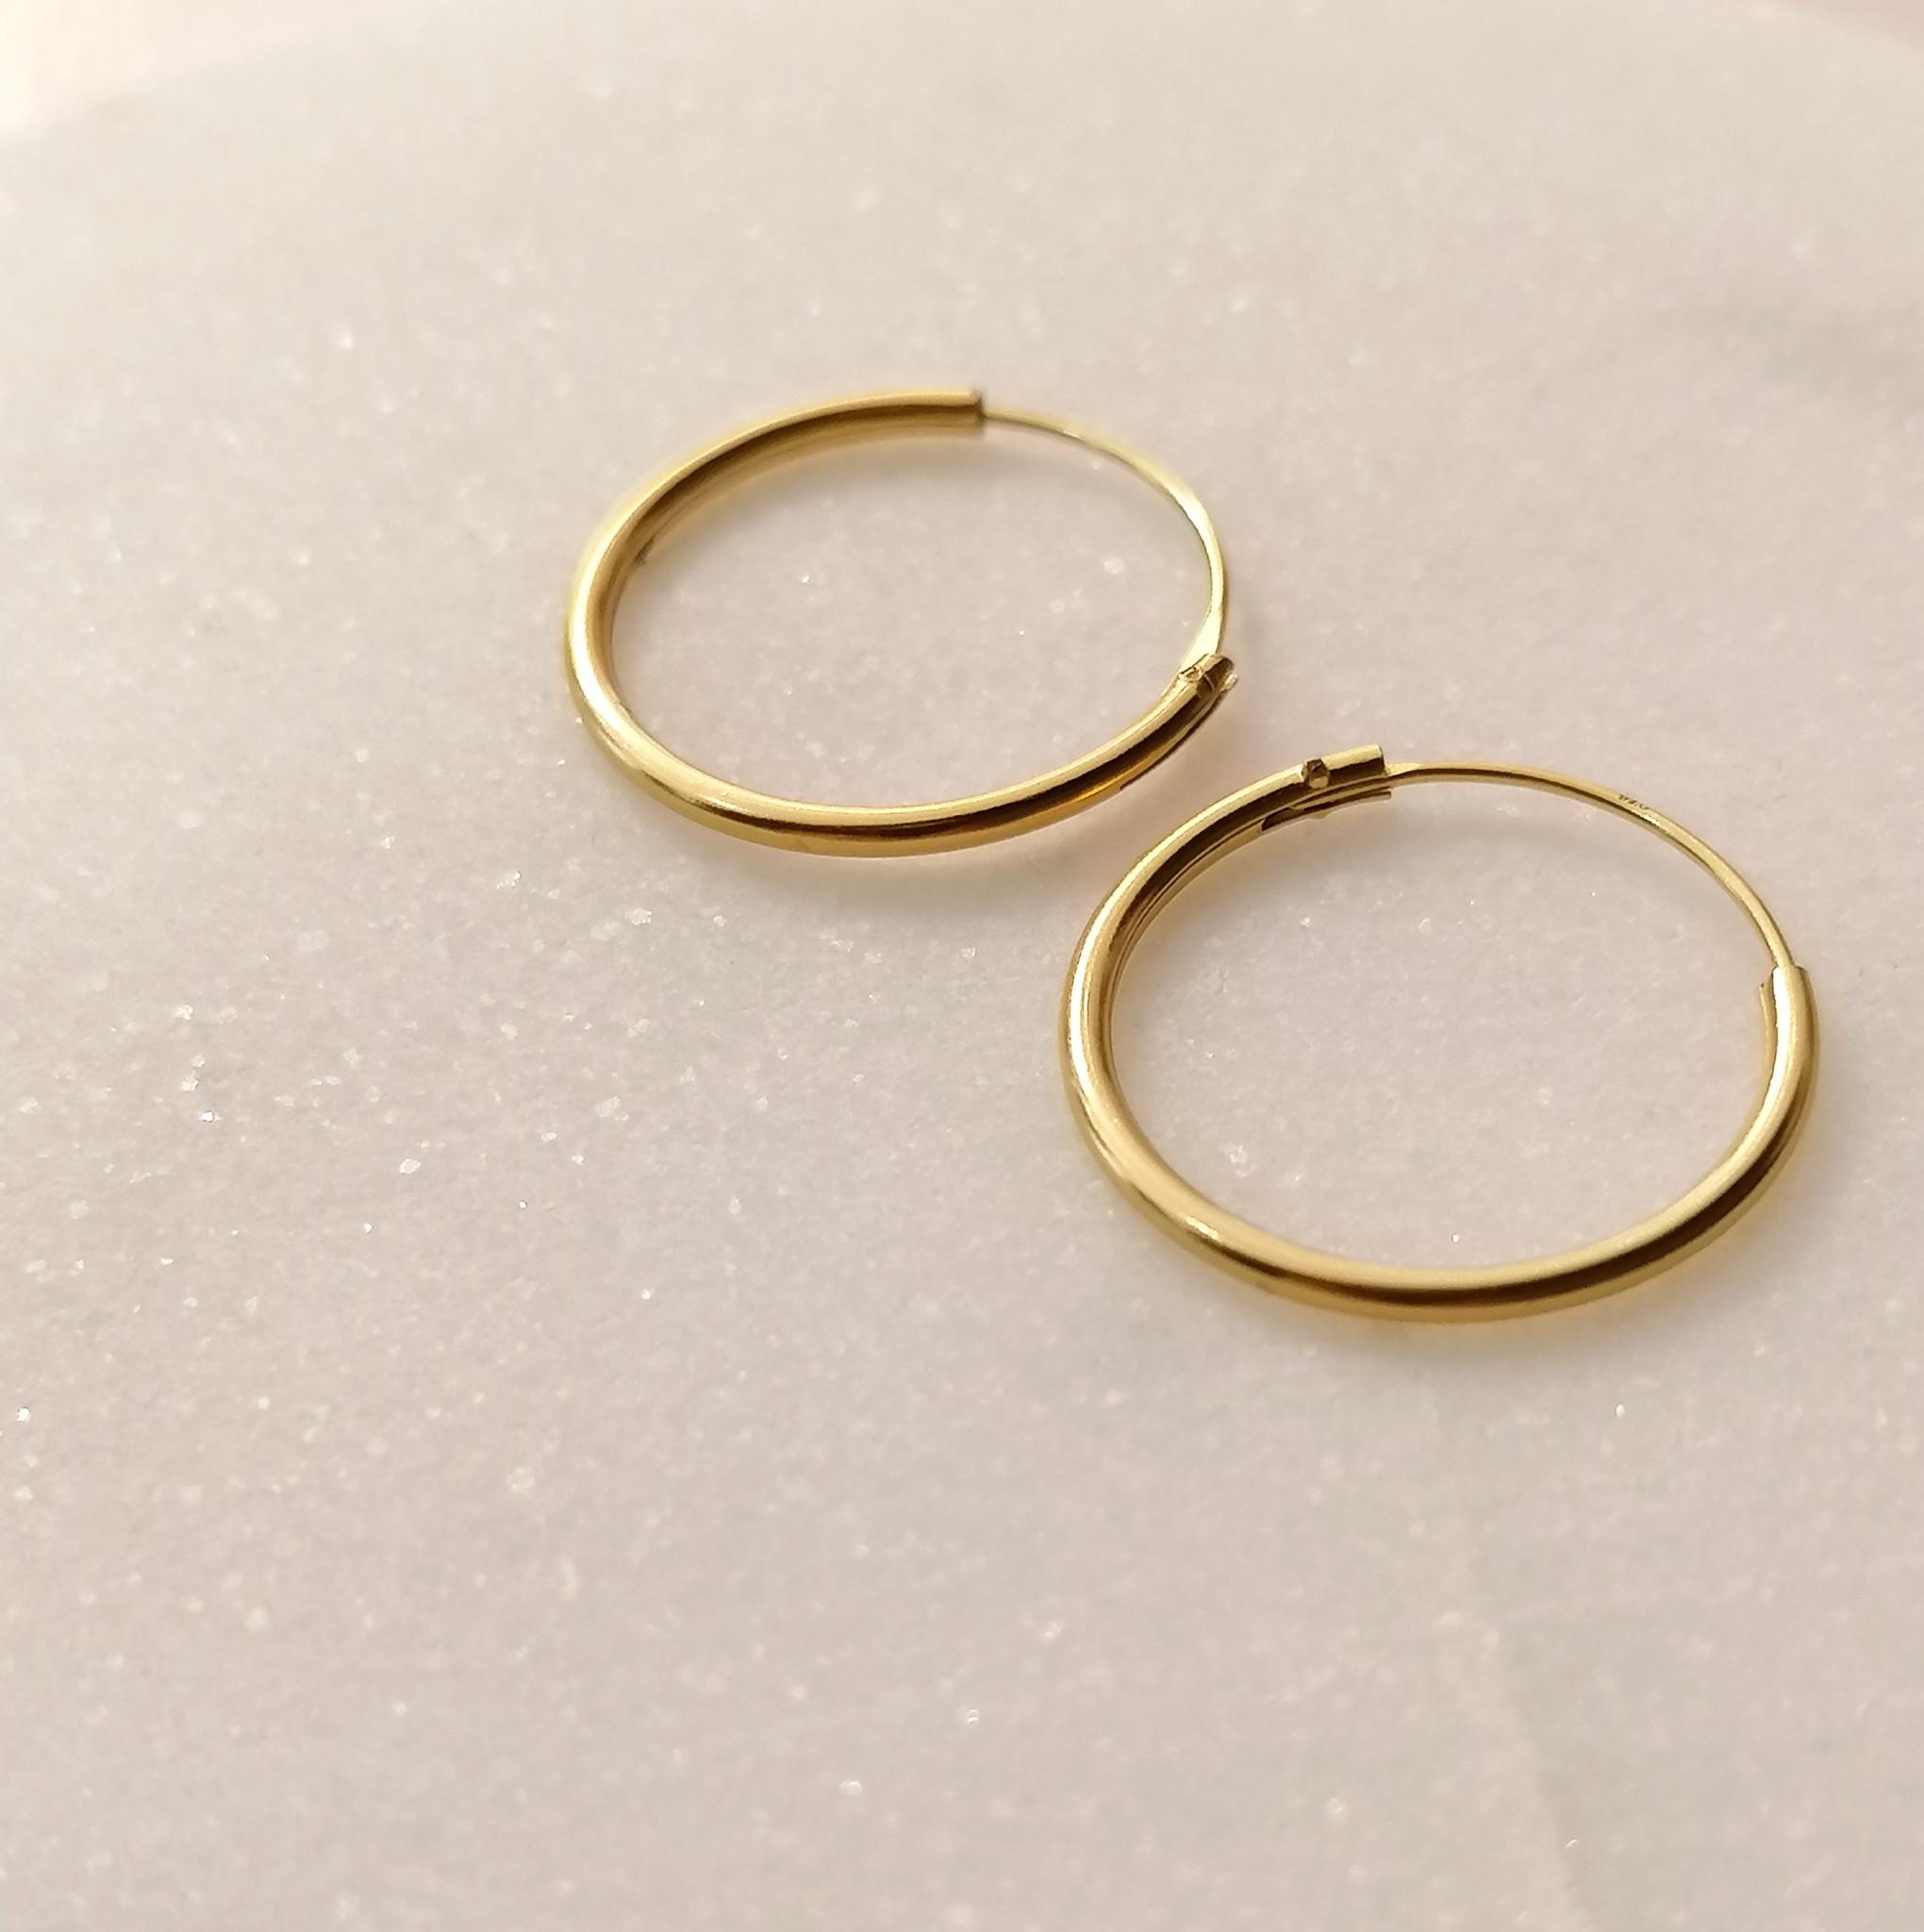 Small Hoops Earrings - 925 Sterling Silver Gold-5